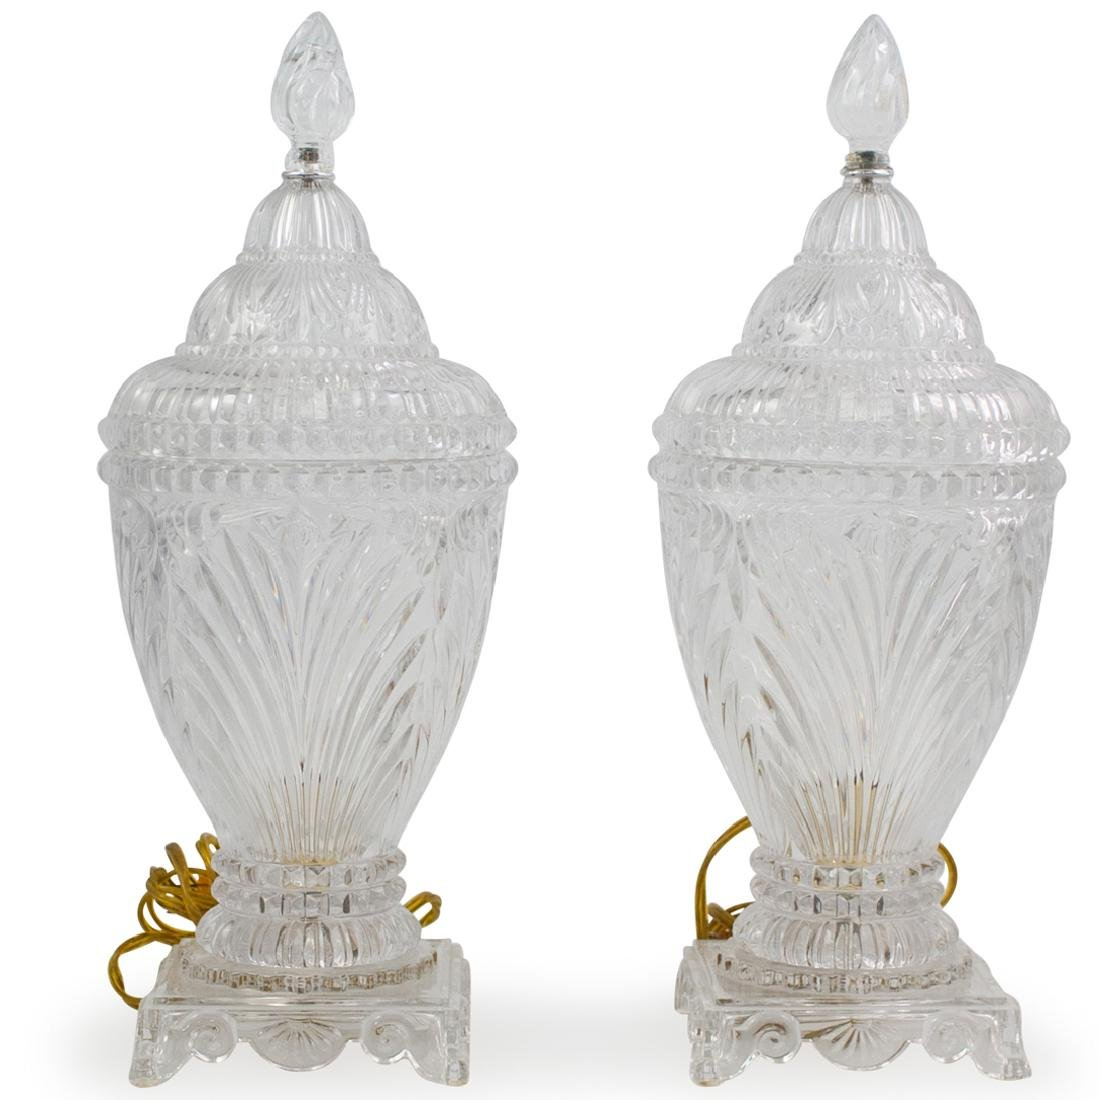 Pair of Cut Crystal Urn Lamps